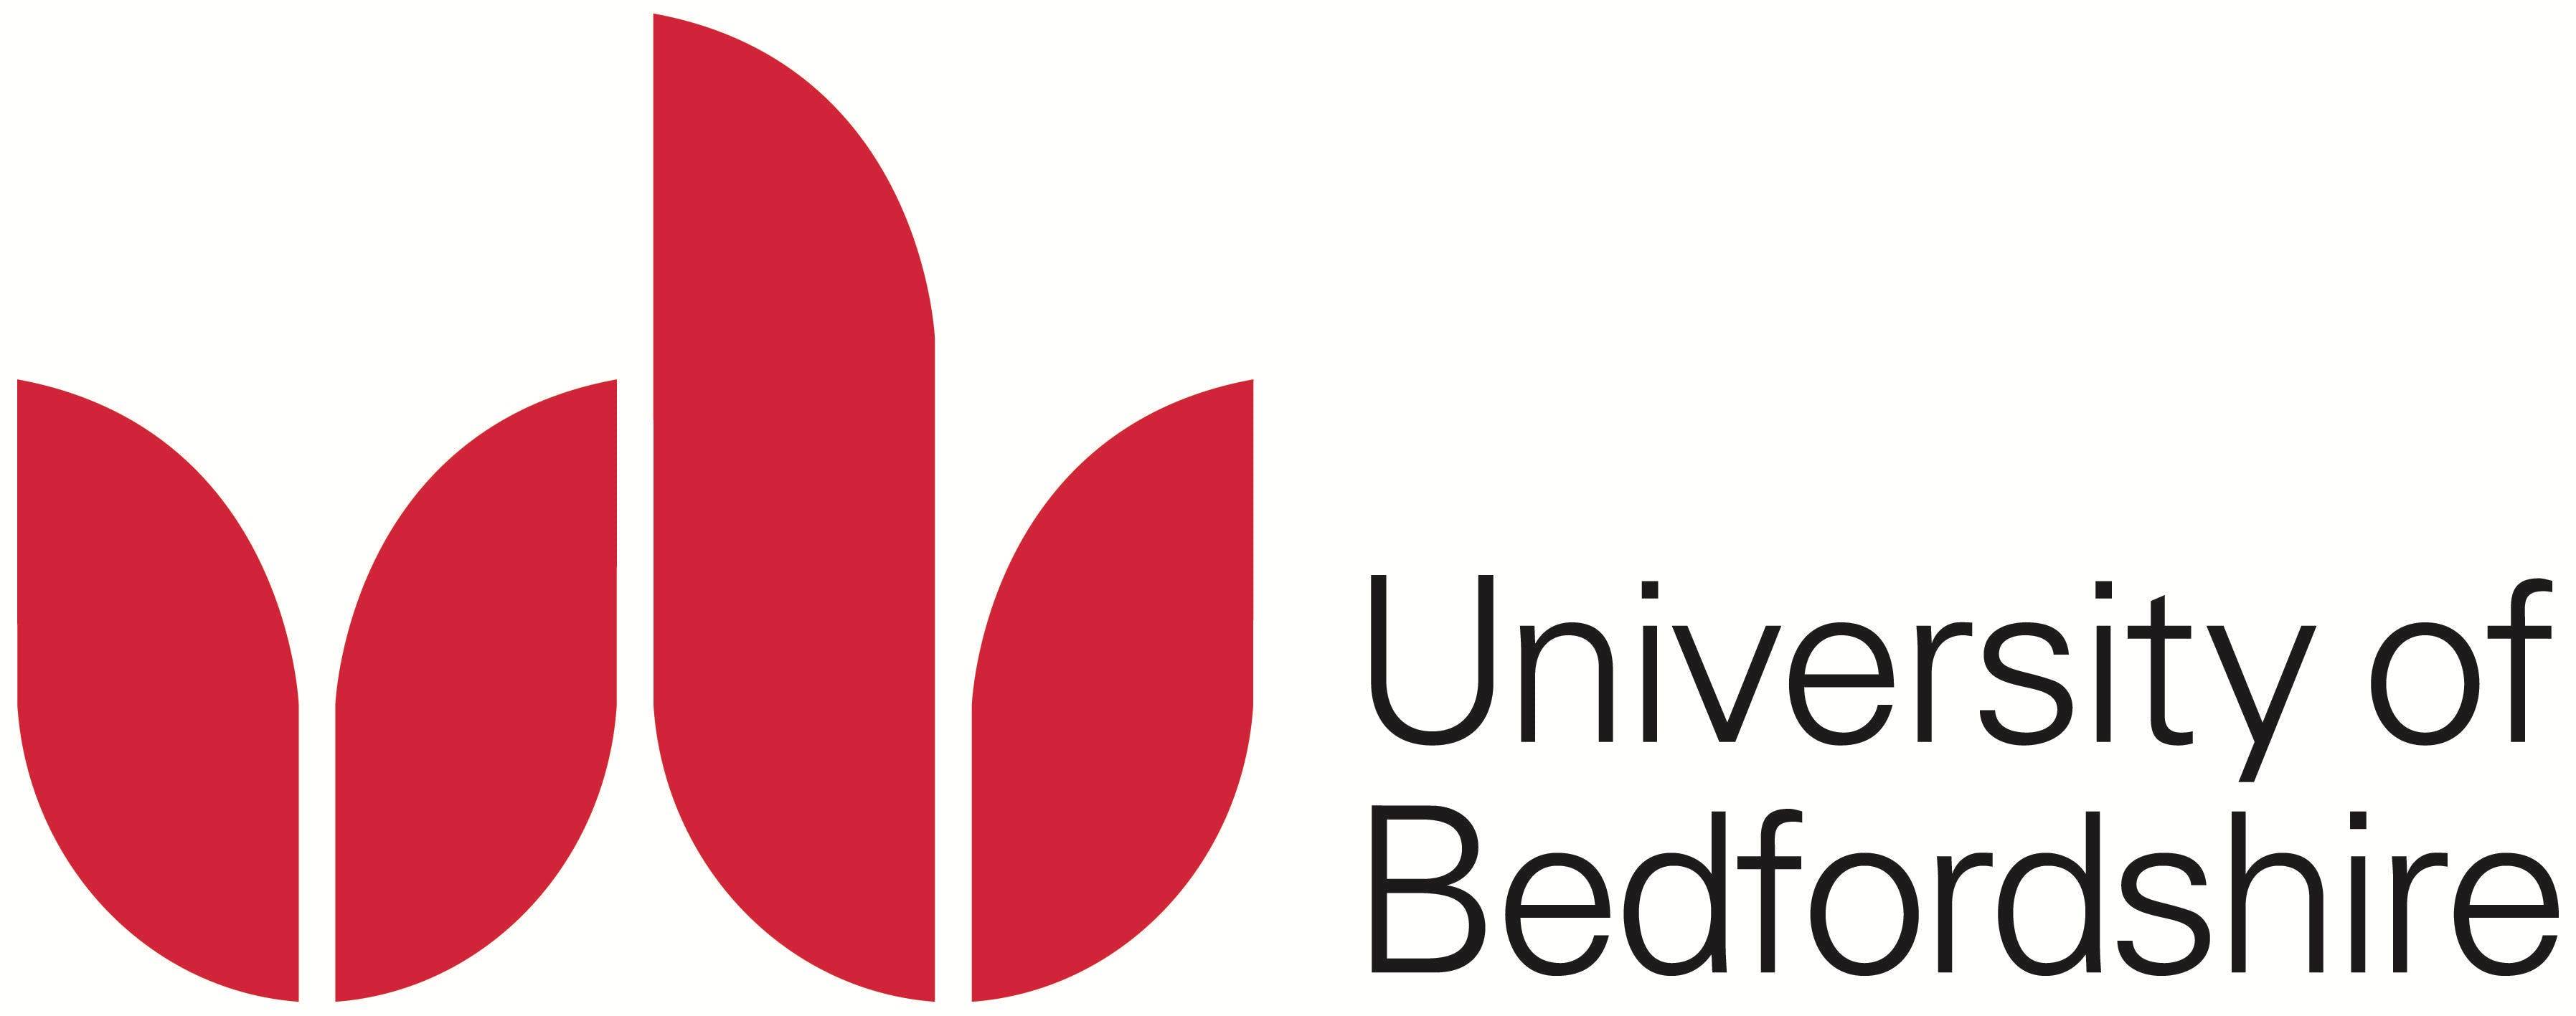 University of Bedfordshire Campus Tour - Luton Campus